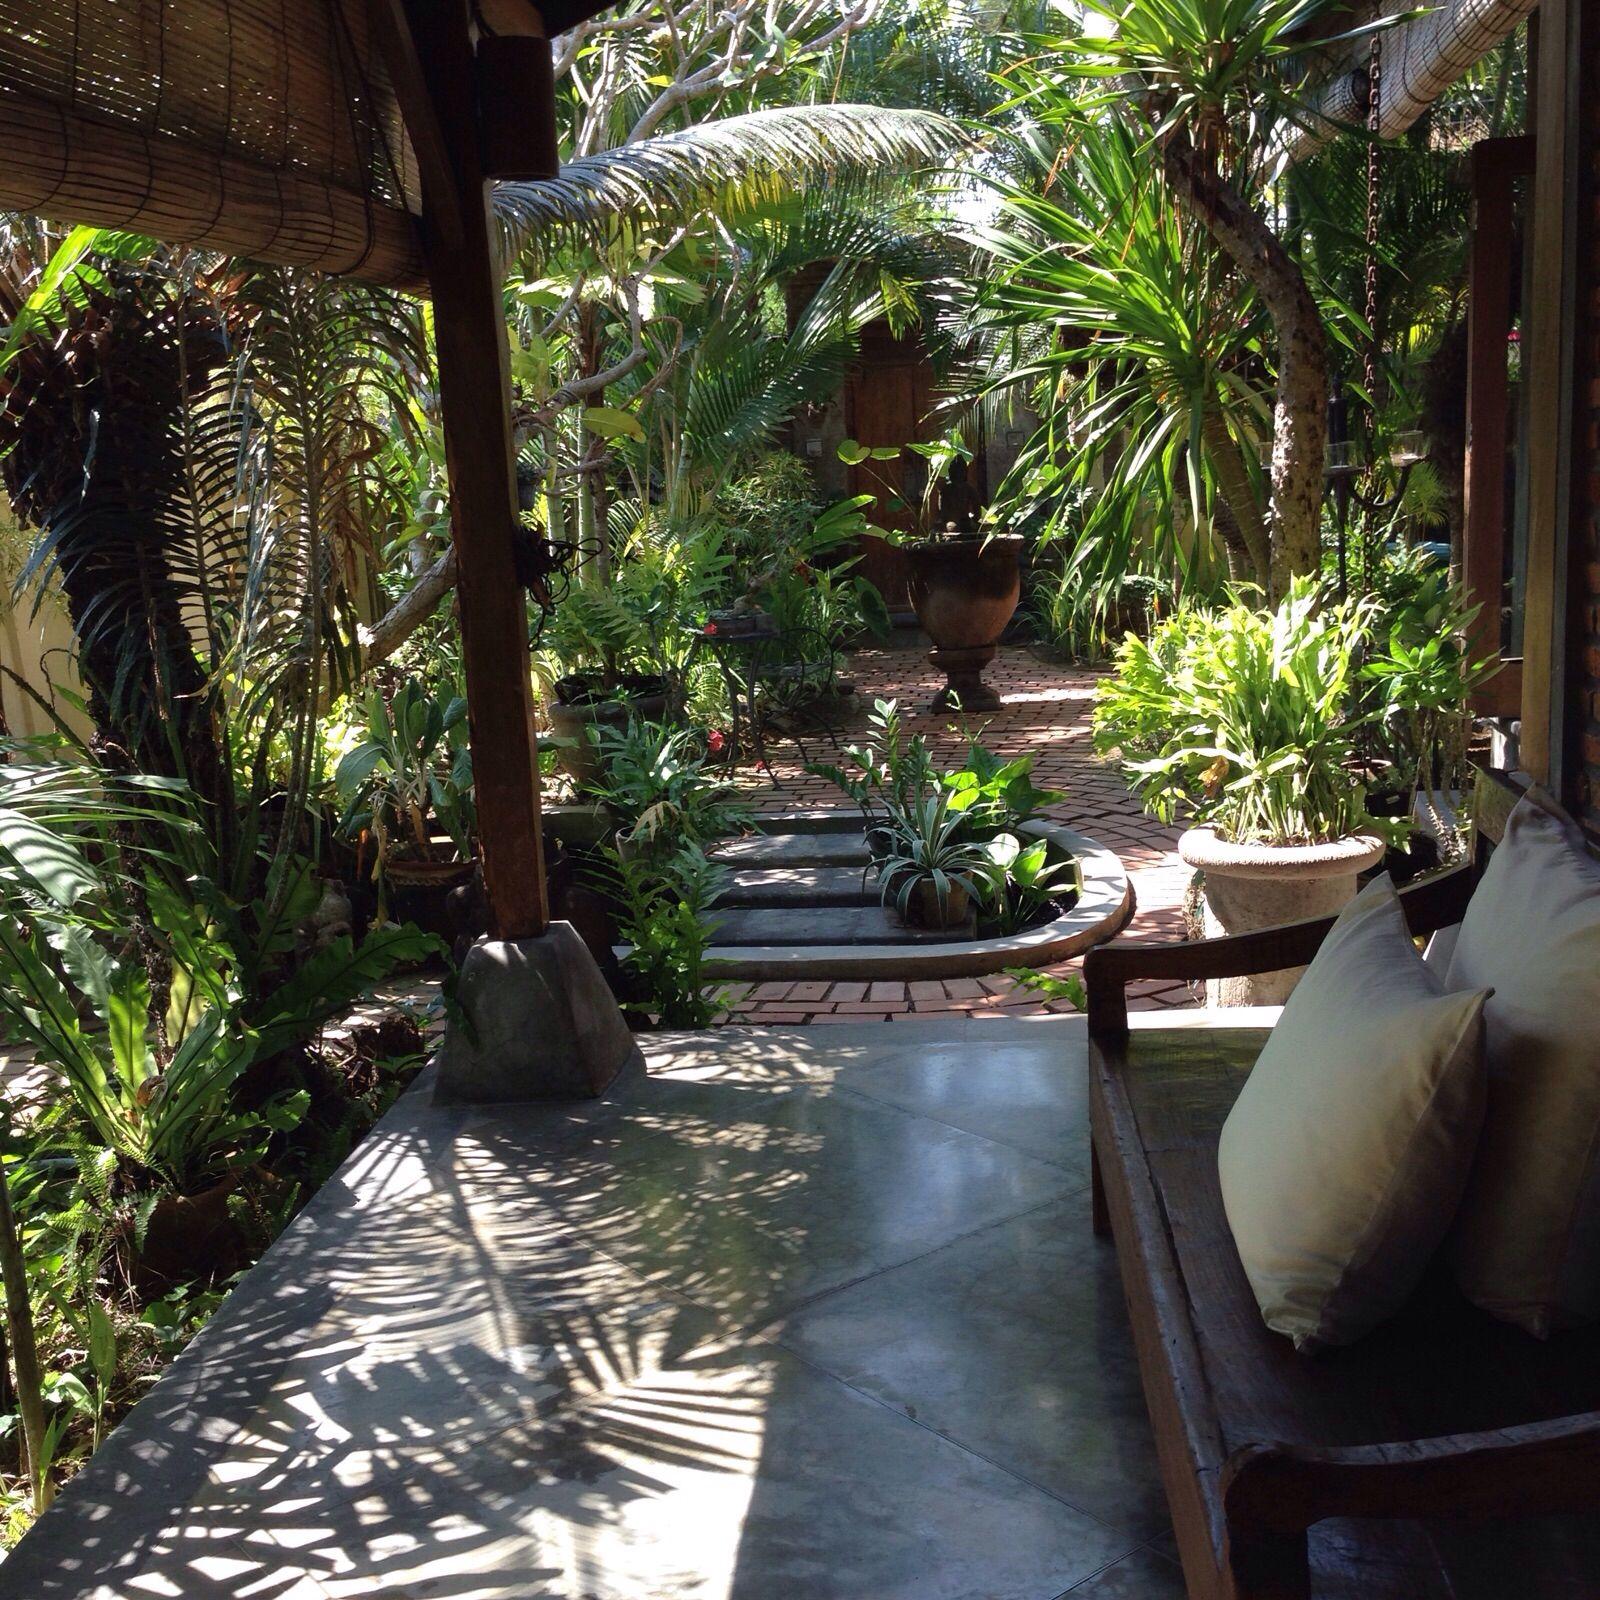 Bali style balinese home lima san house balinese garden for Bali landscape design